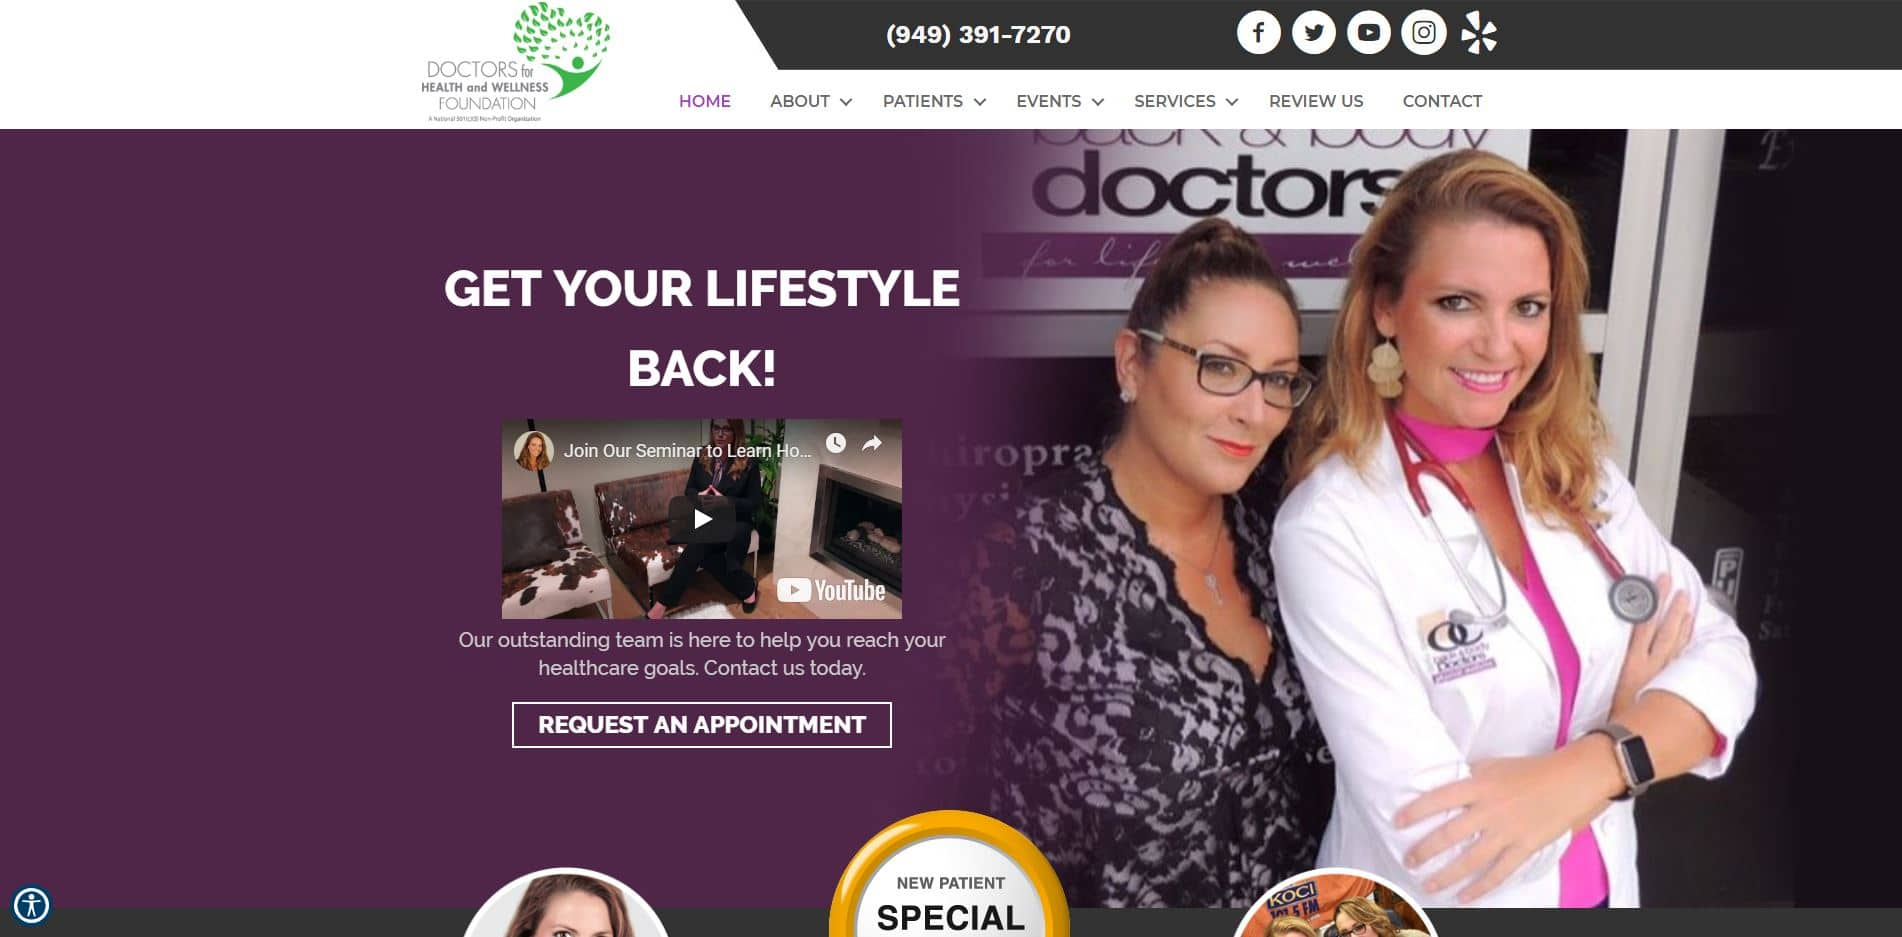 Chiropractor in Irvine